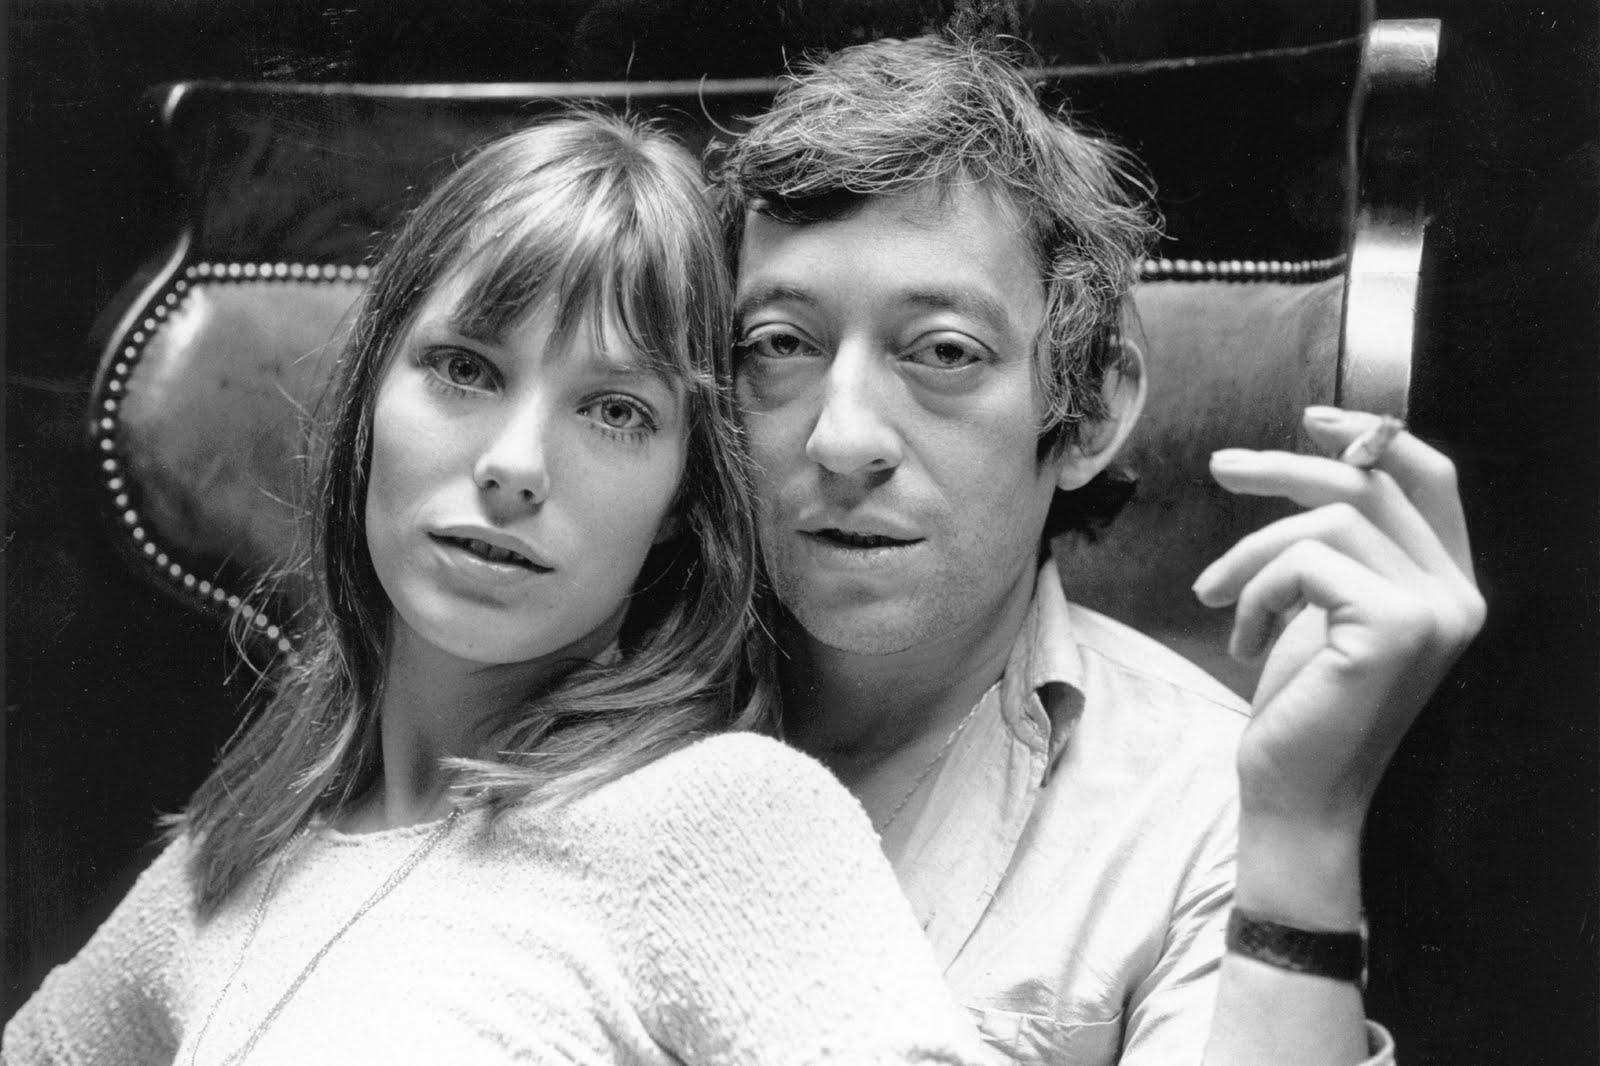 http://1.bp.blogspot.com/-lhYmlN1EMPM/TnKQaYkSqWI/AAAAAAAAK0k/MlTxKXuLHMI/s1600/Serge_Gainsbourg_and_Jane_Birkin.jpg